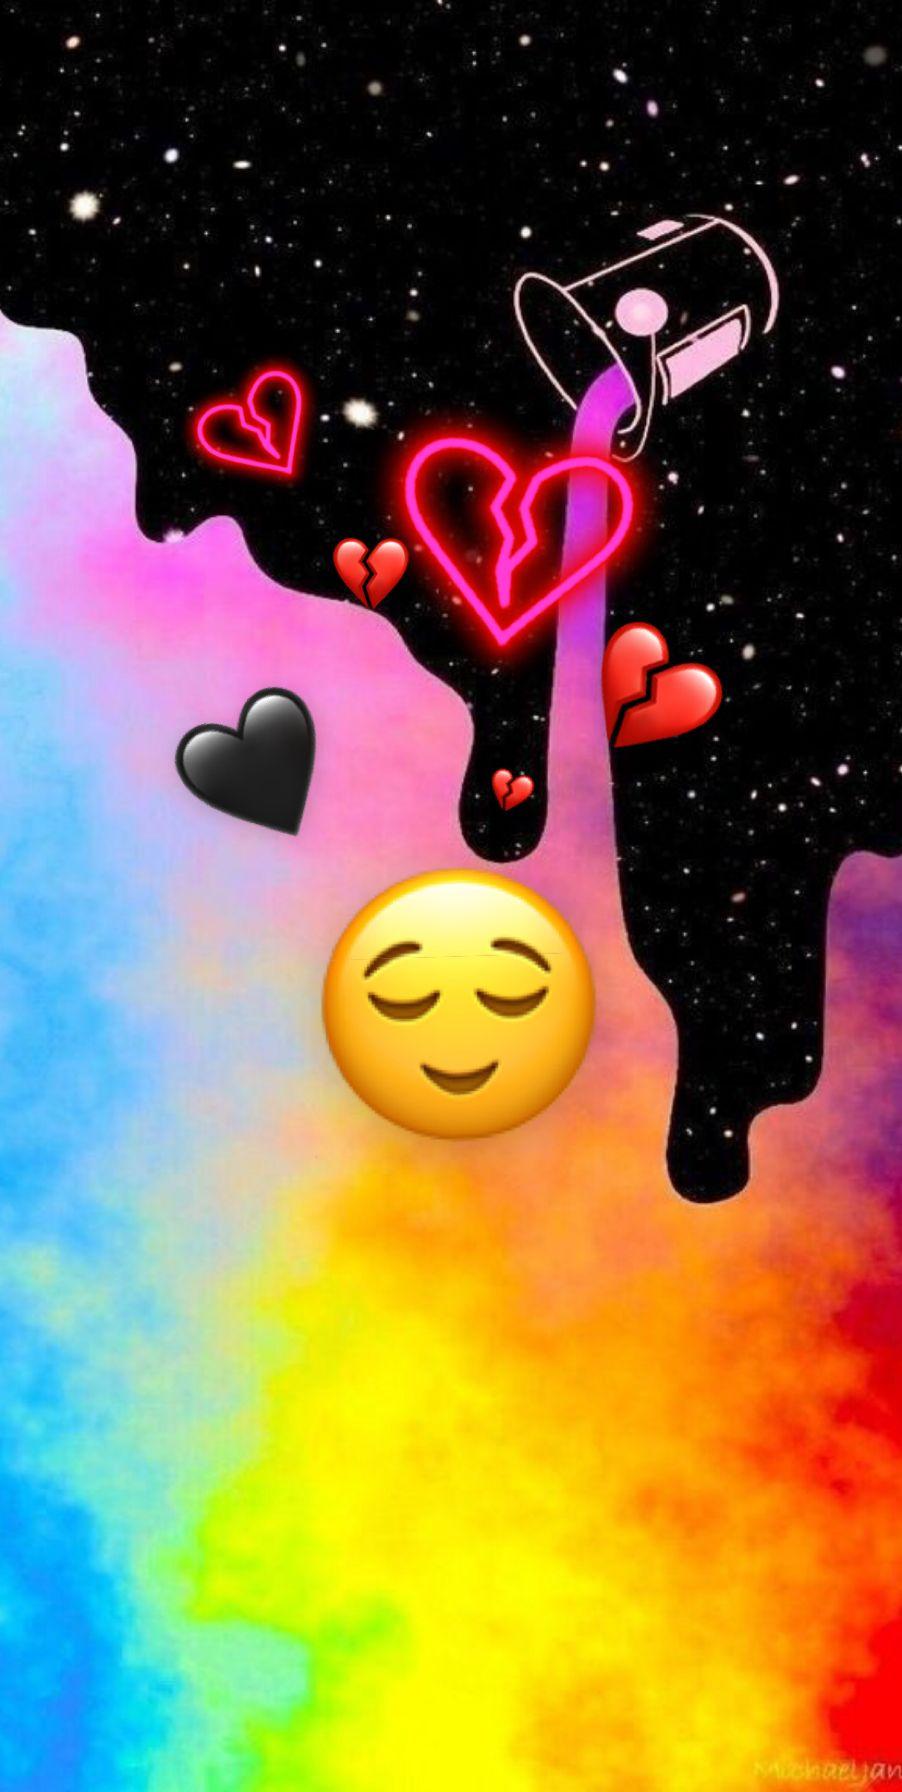 Covered Heart Break Emoji Wallpaper Iphone Cute Emoji Wallpaper Cartoon Wallpaper Iphone